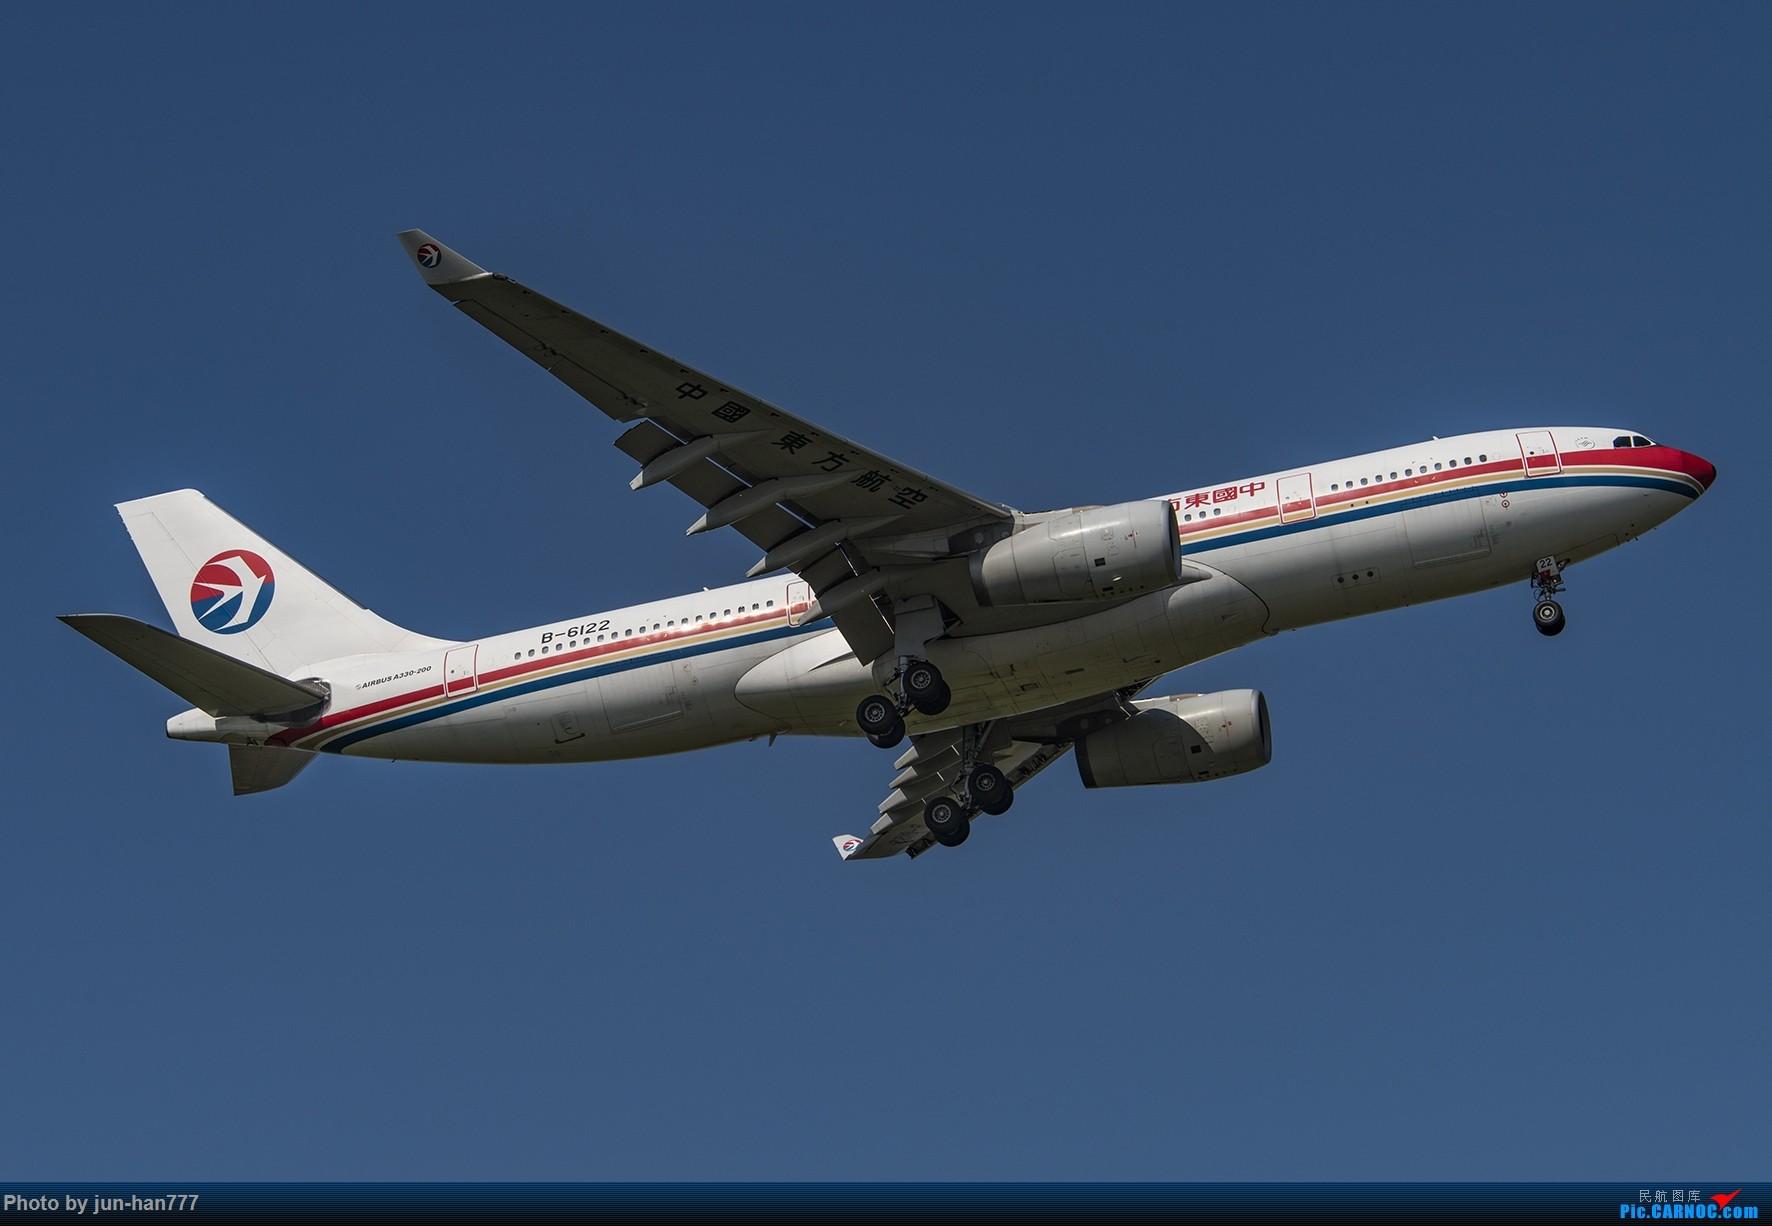 [转贴]东航 AIRBUS A330-200 B-6122